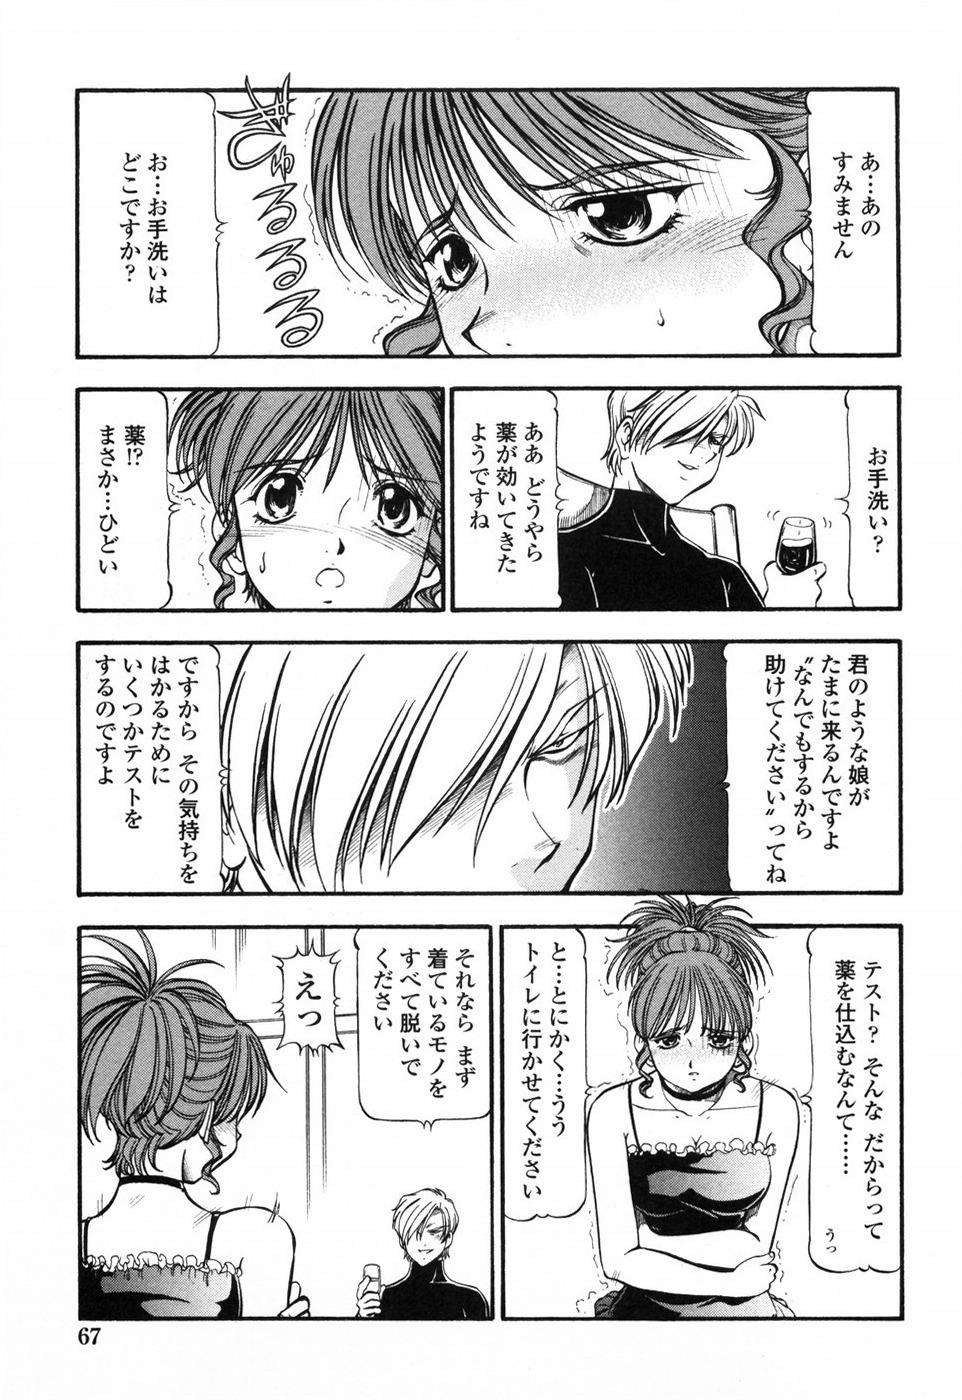 Kichiku Houteishiki - Equation of brutal person 72